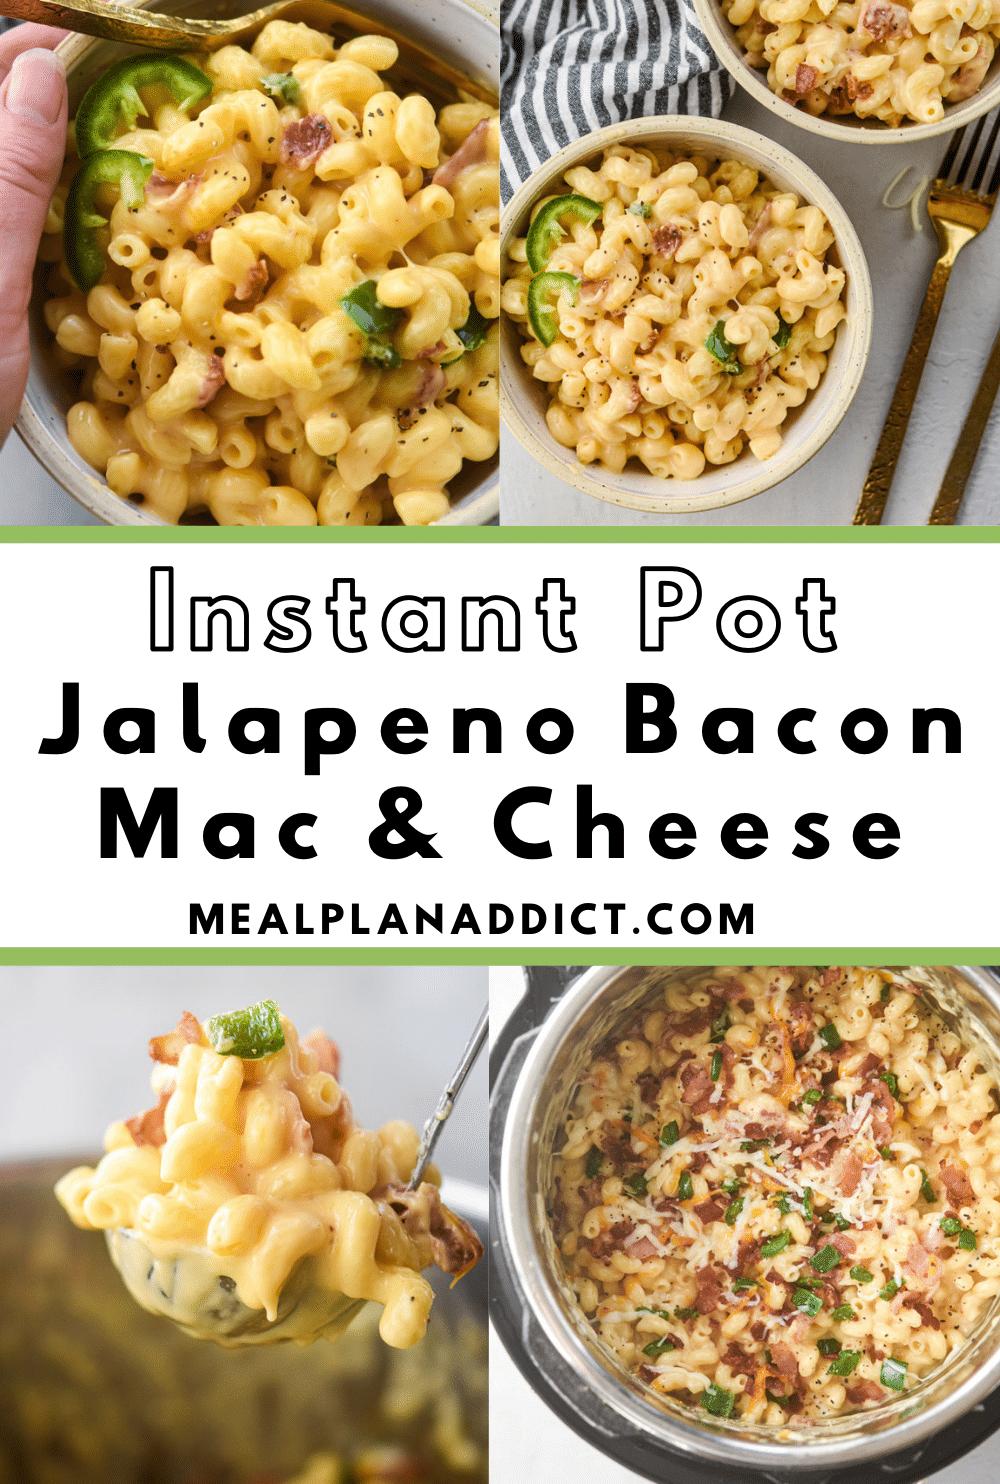 Jalapeno Bacon Mac and Cheese Pinterest Pin image